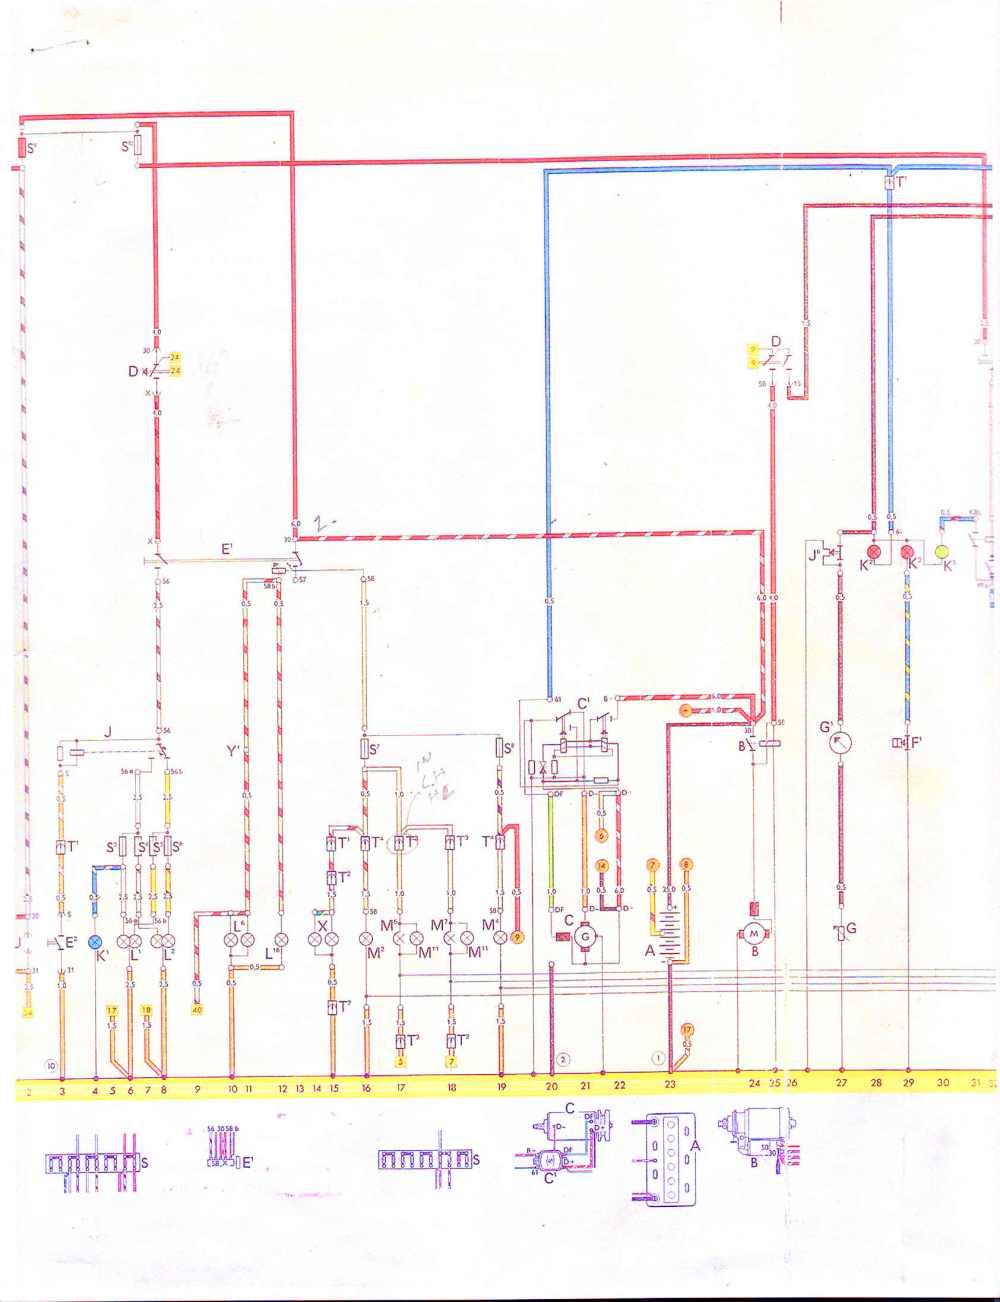 medium resolution of 181 vw thing wiring diagram